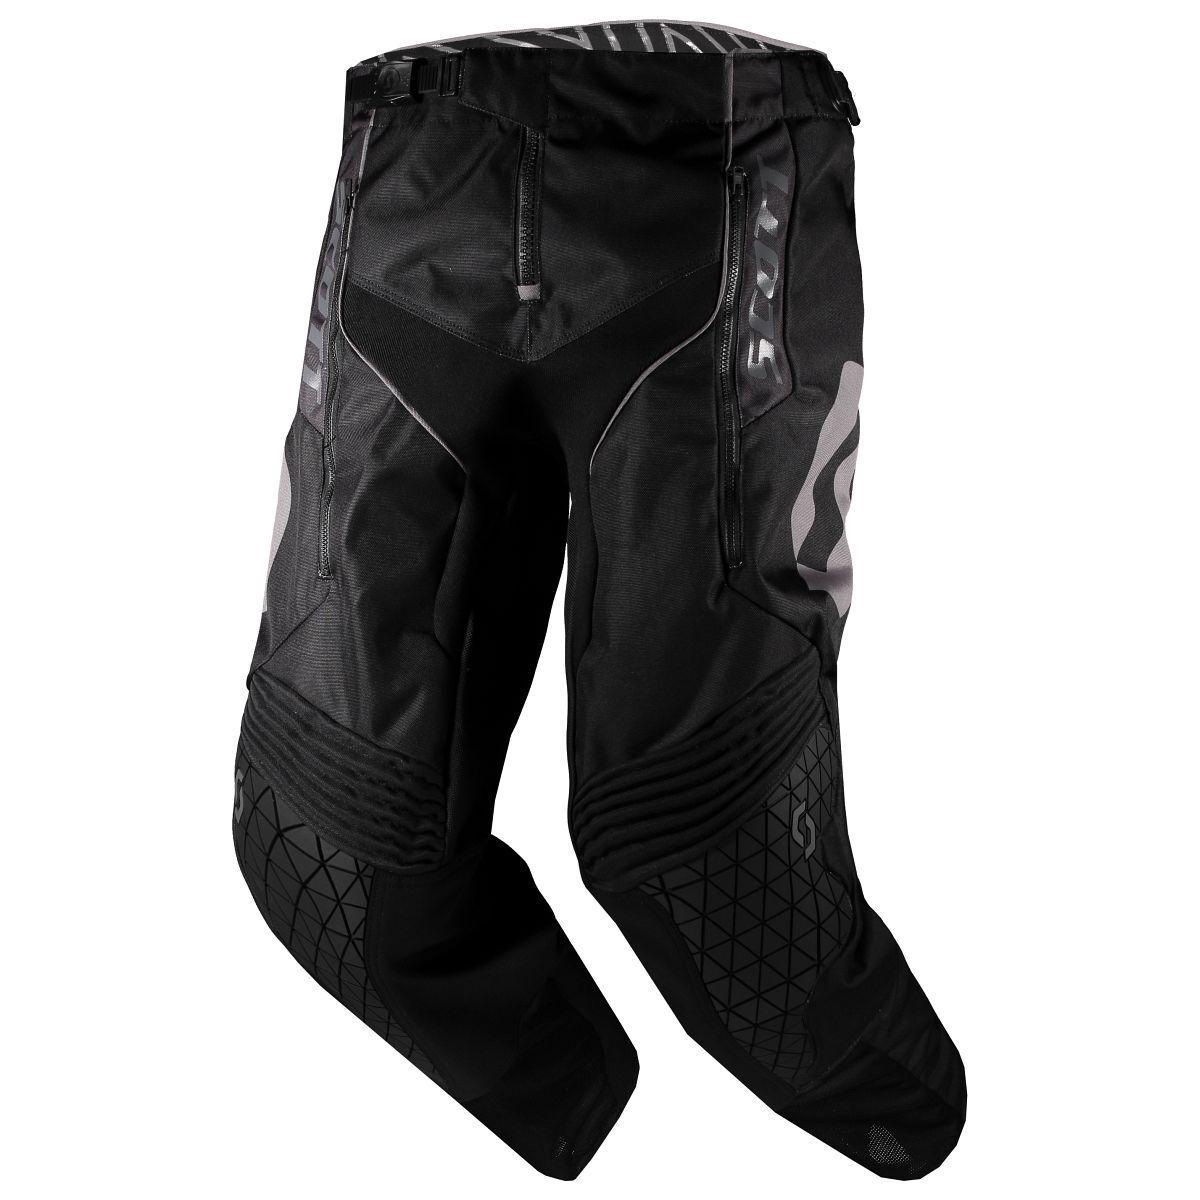 Scott Enduro MX Motocross DH Vélo Pantalon noir 2019